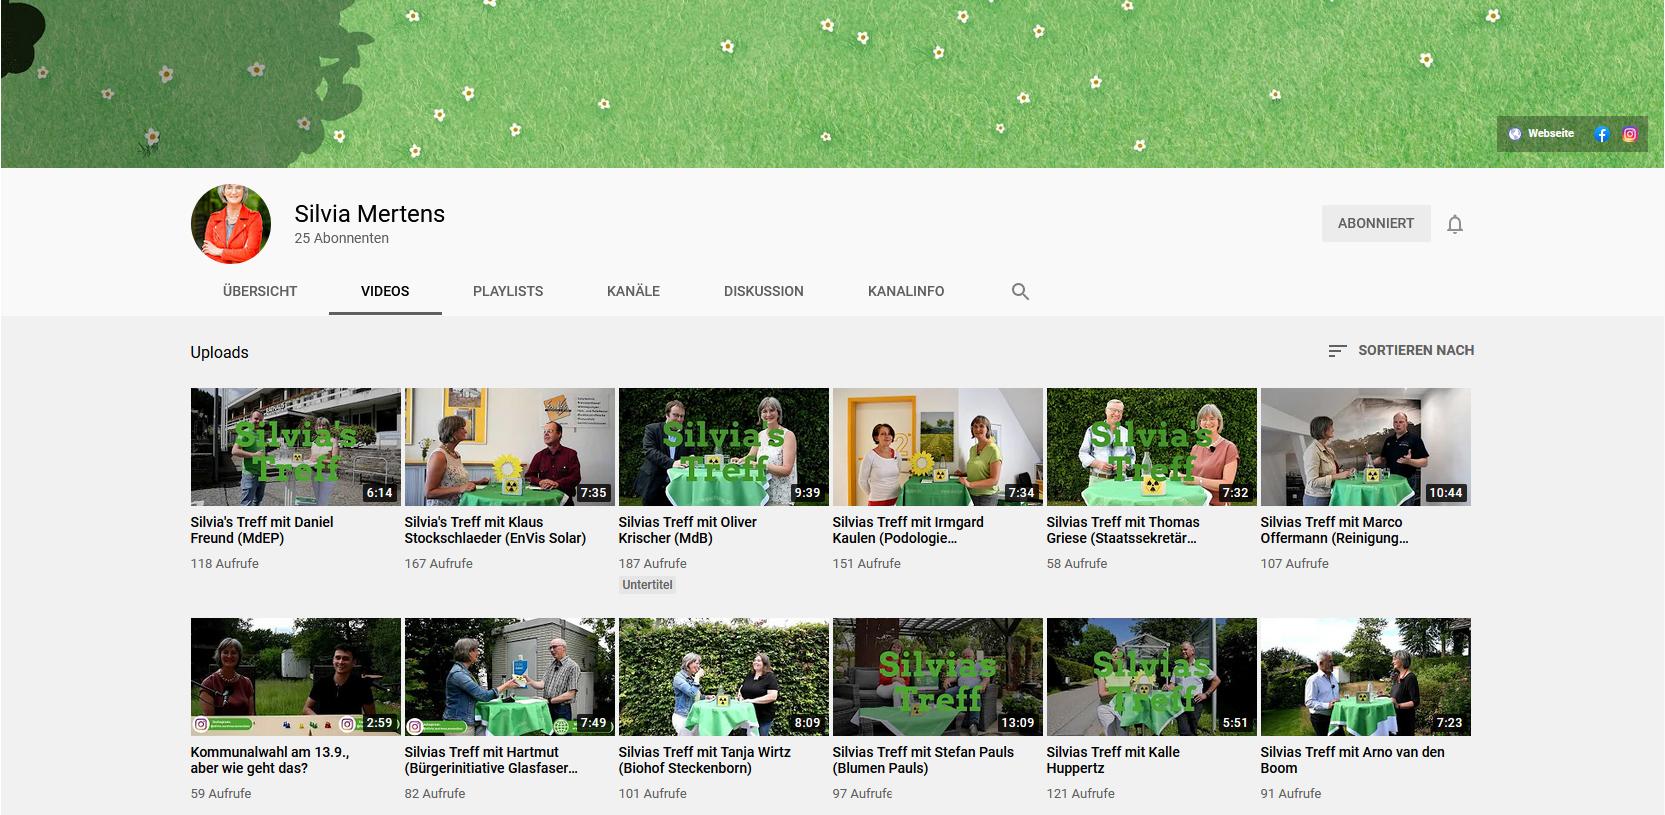 Silvias Treff auf YouTube